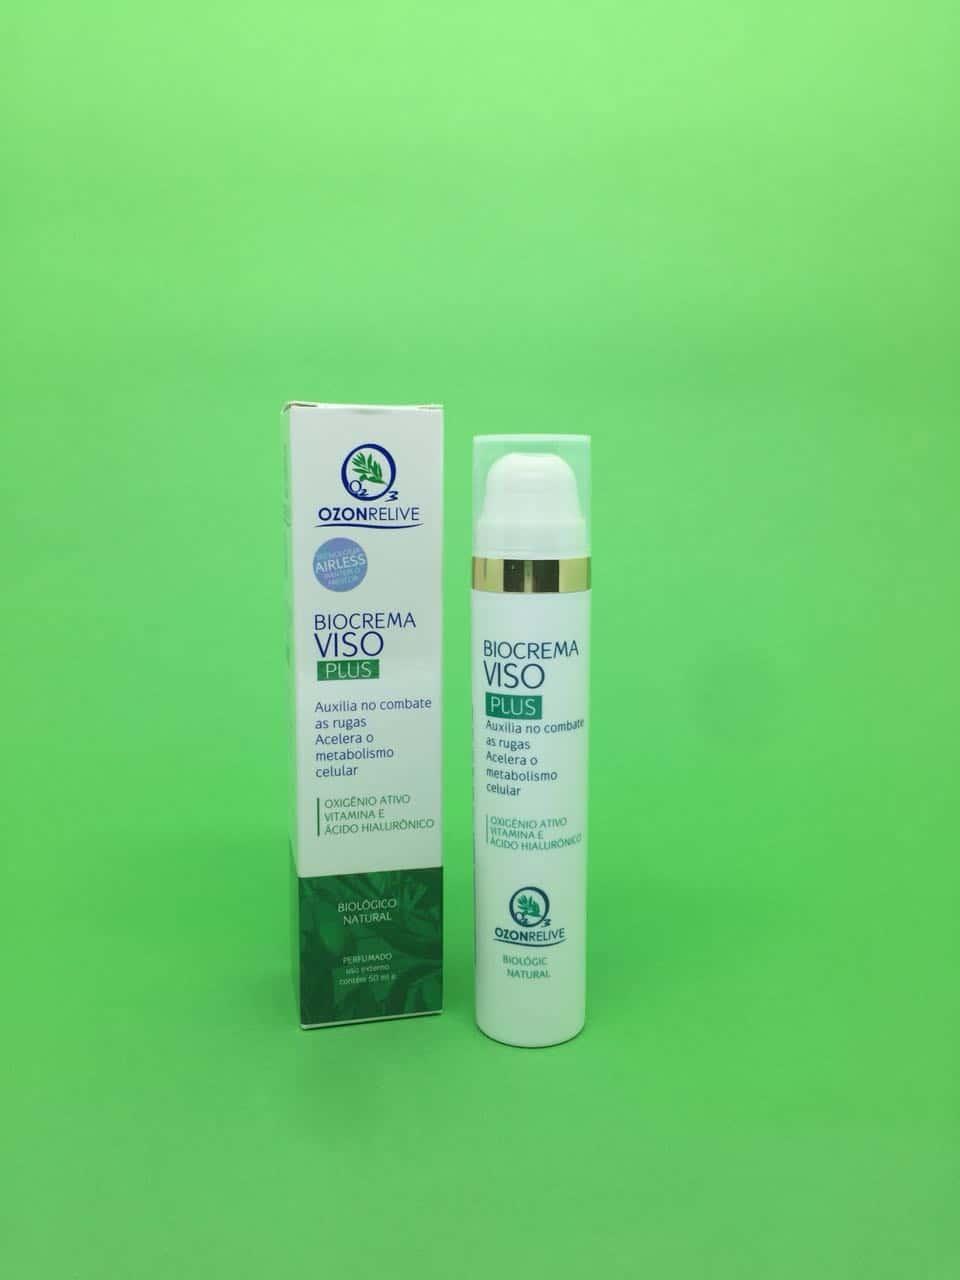 Ozonrelive Biocrema Viso Plus 2a